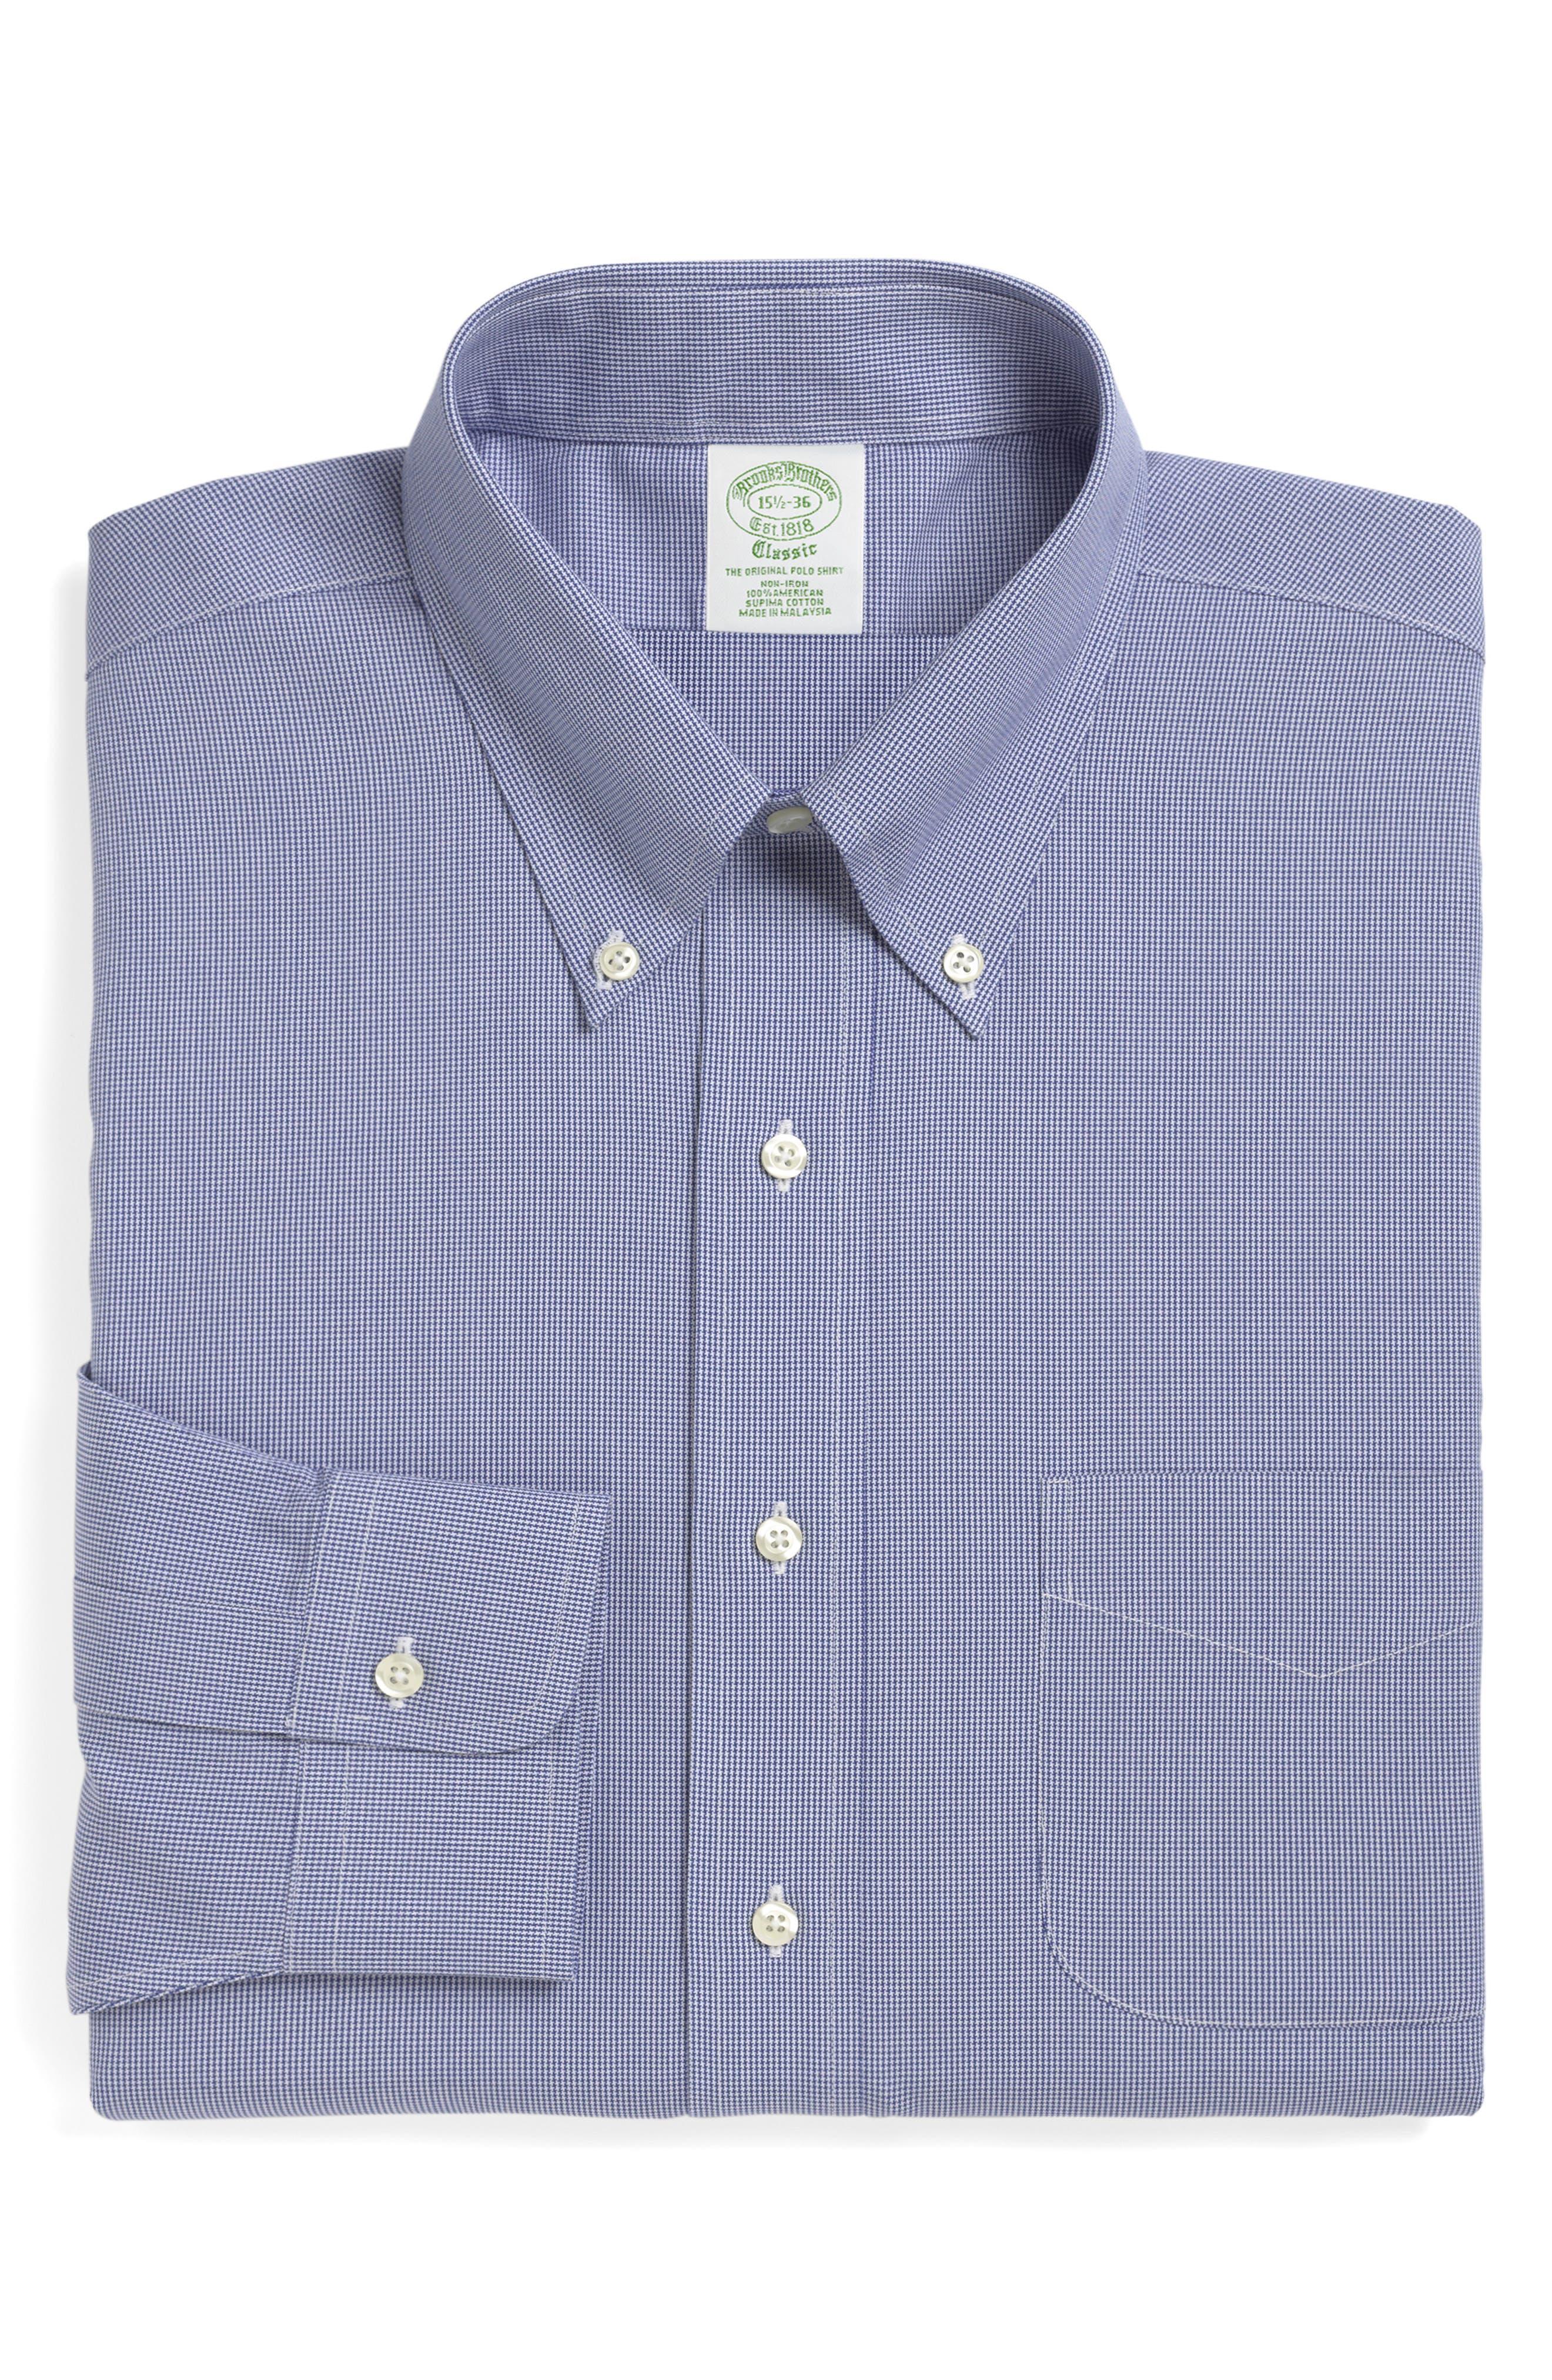 Trim Fit Houndstooth Dress Shirt,                             Main thumbnail 1, color,                             BLUE